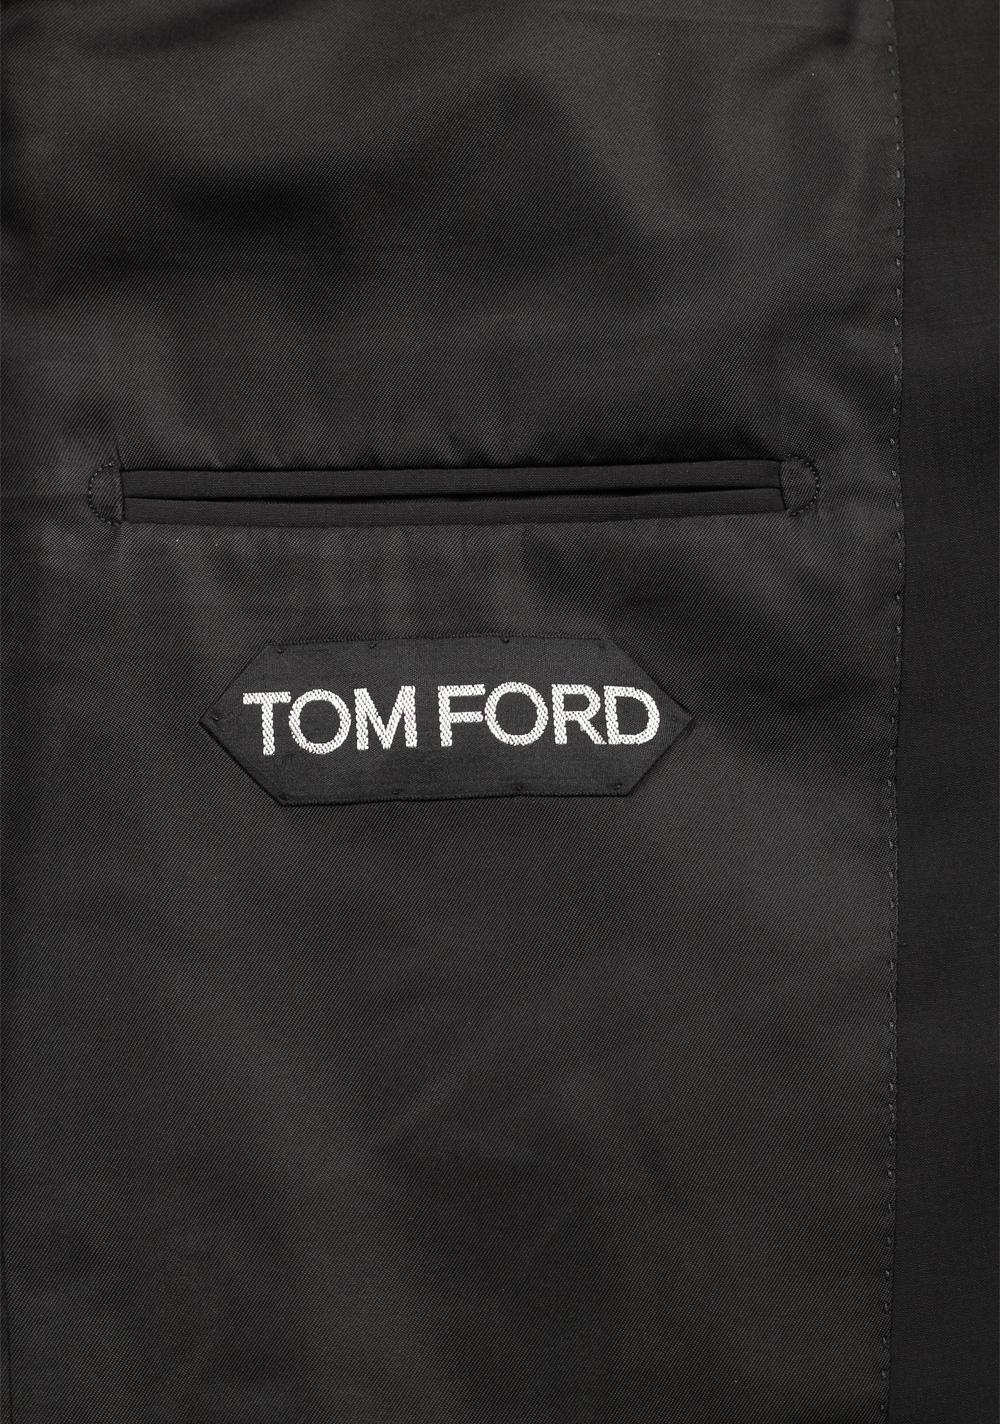 TOM FORD Shelton Black Suit Size 48 / 38R U.S. In Wool Blend | Costume Limité